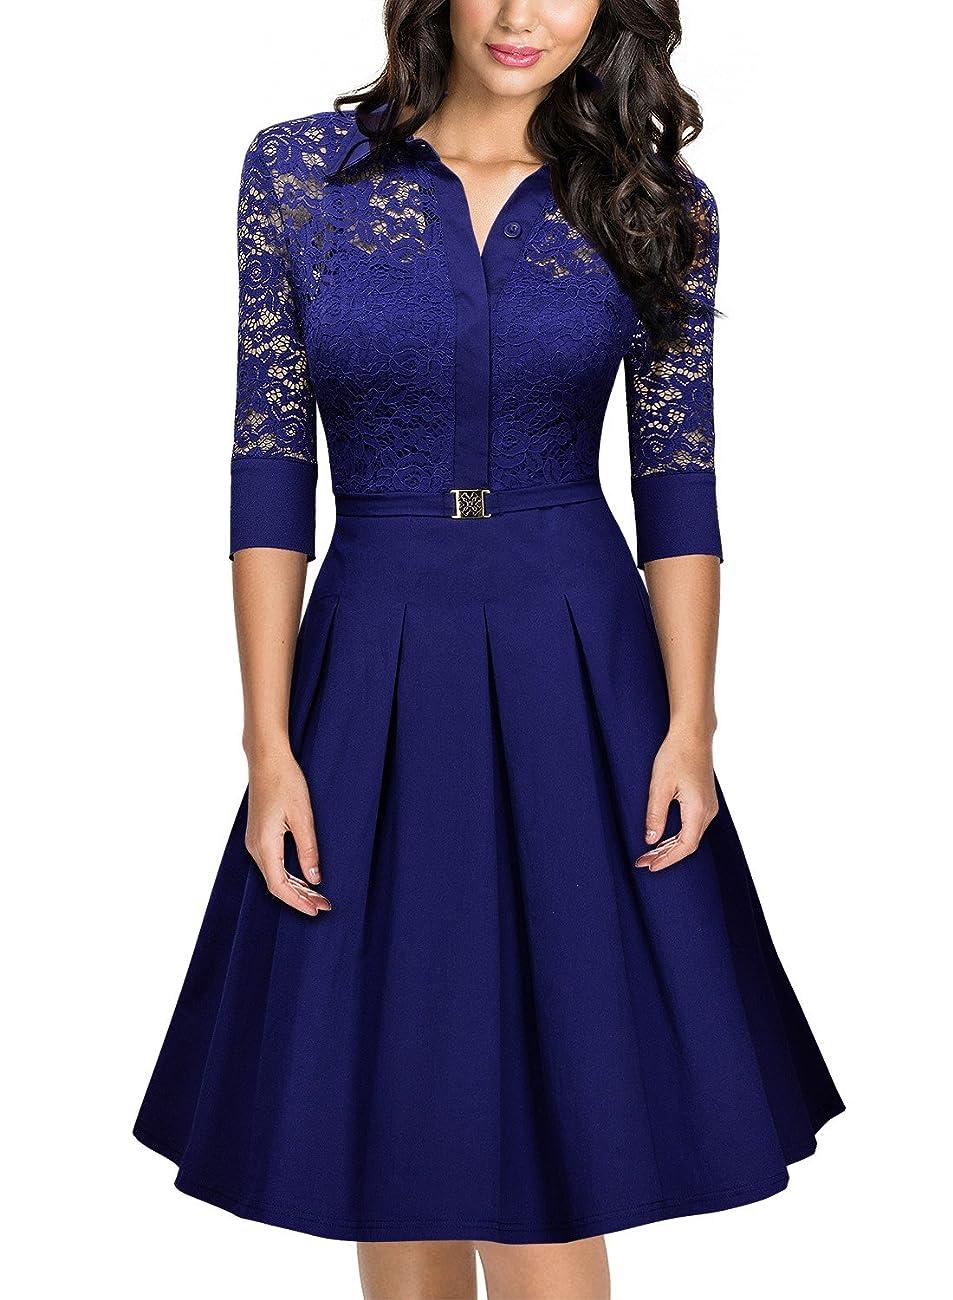 Missmay Women's Vintage 1950s Style 3/4 Sleeve Black Lace Flare A-line Dress 0